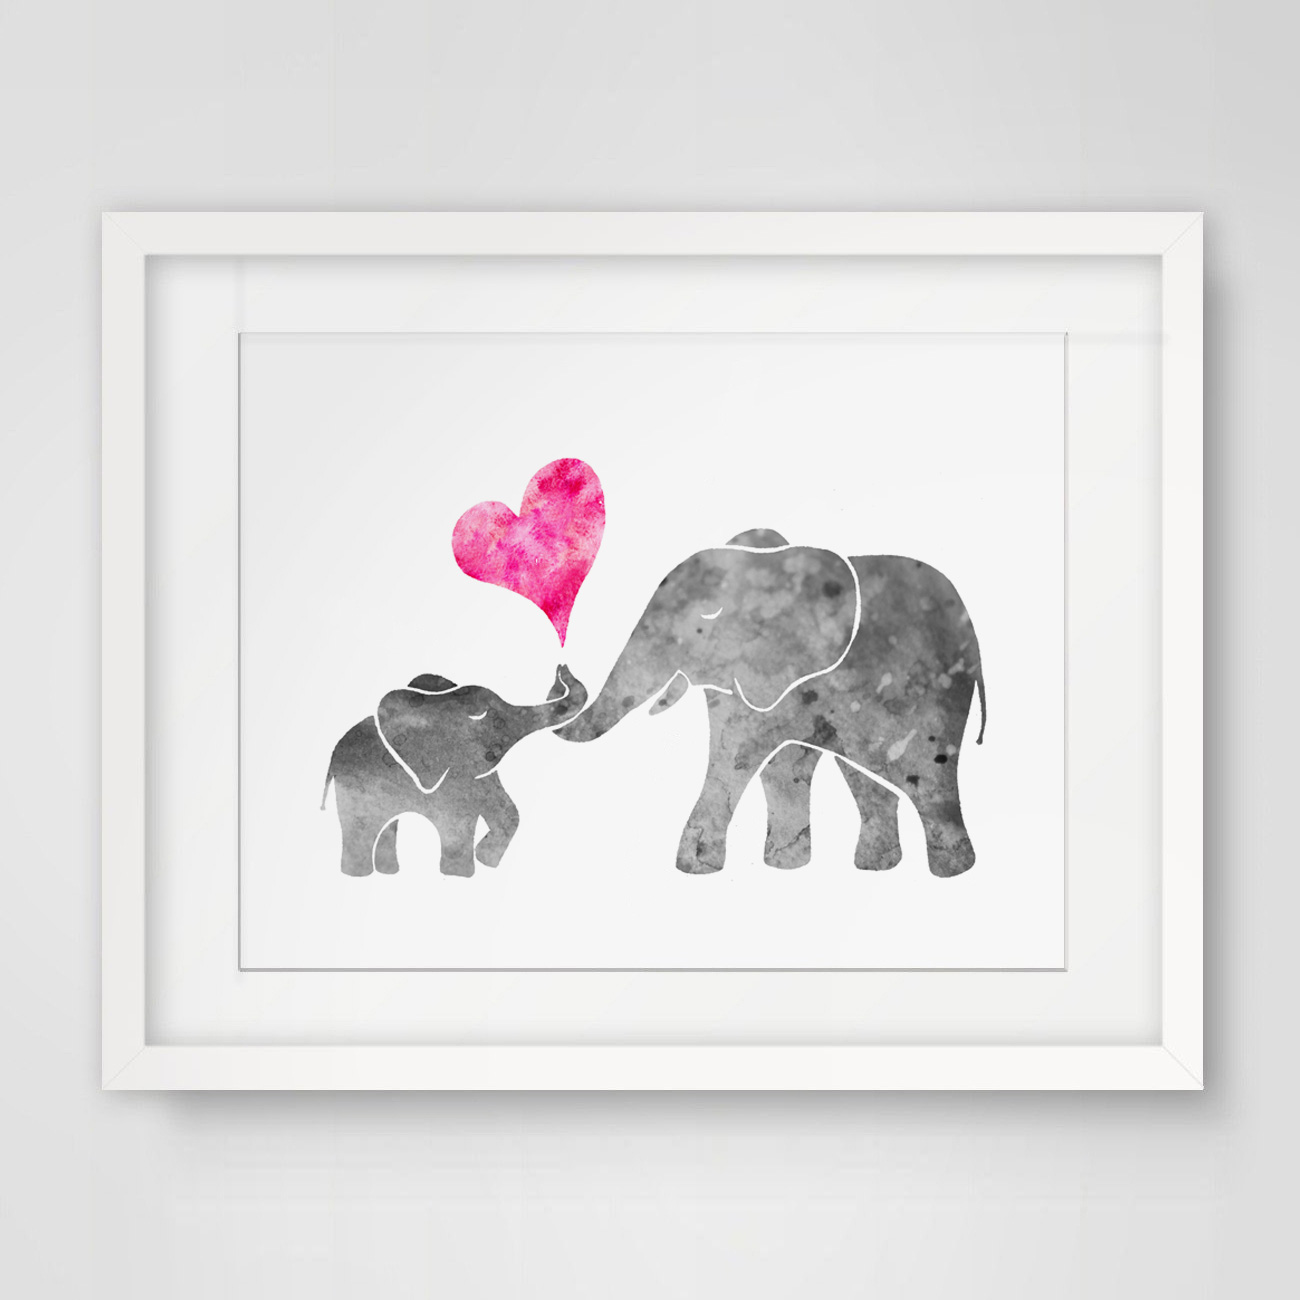 Aquarell Grau Baby Elefant mit Mom Kunstdruck Malerei Wand kunst ...